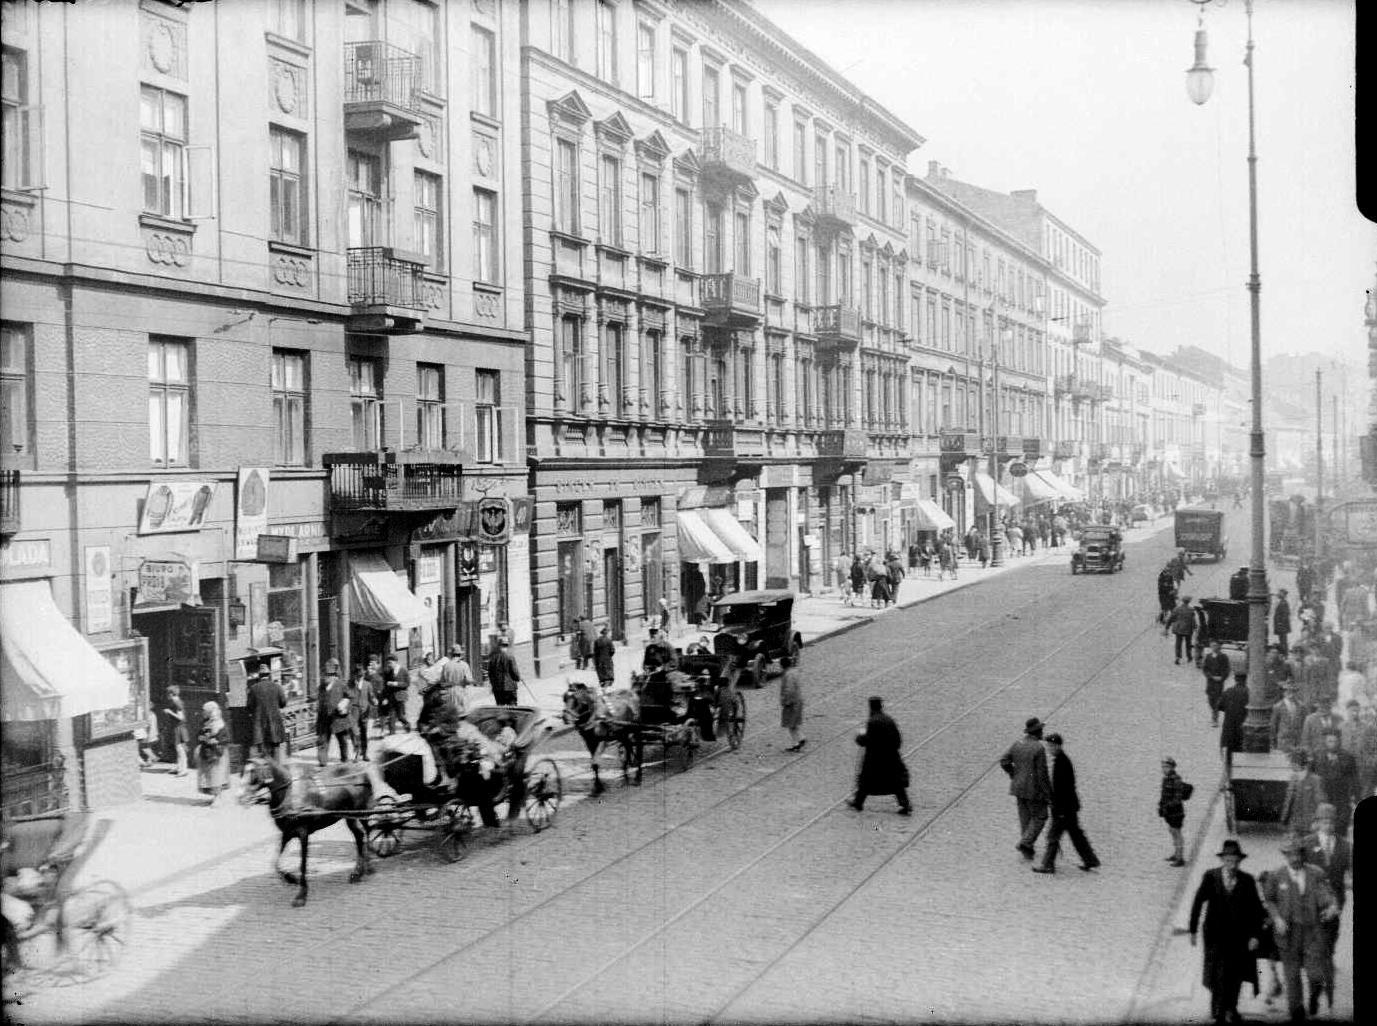 <p>Nalewki Street,&nbsp;1930s.</p>